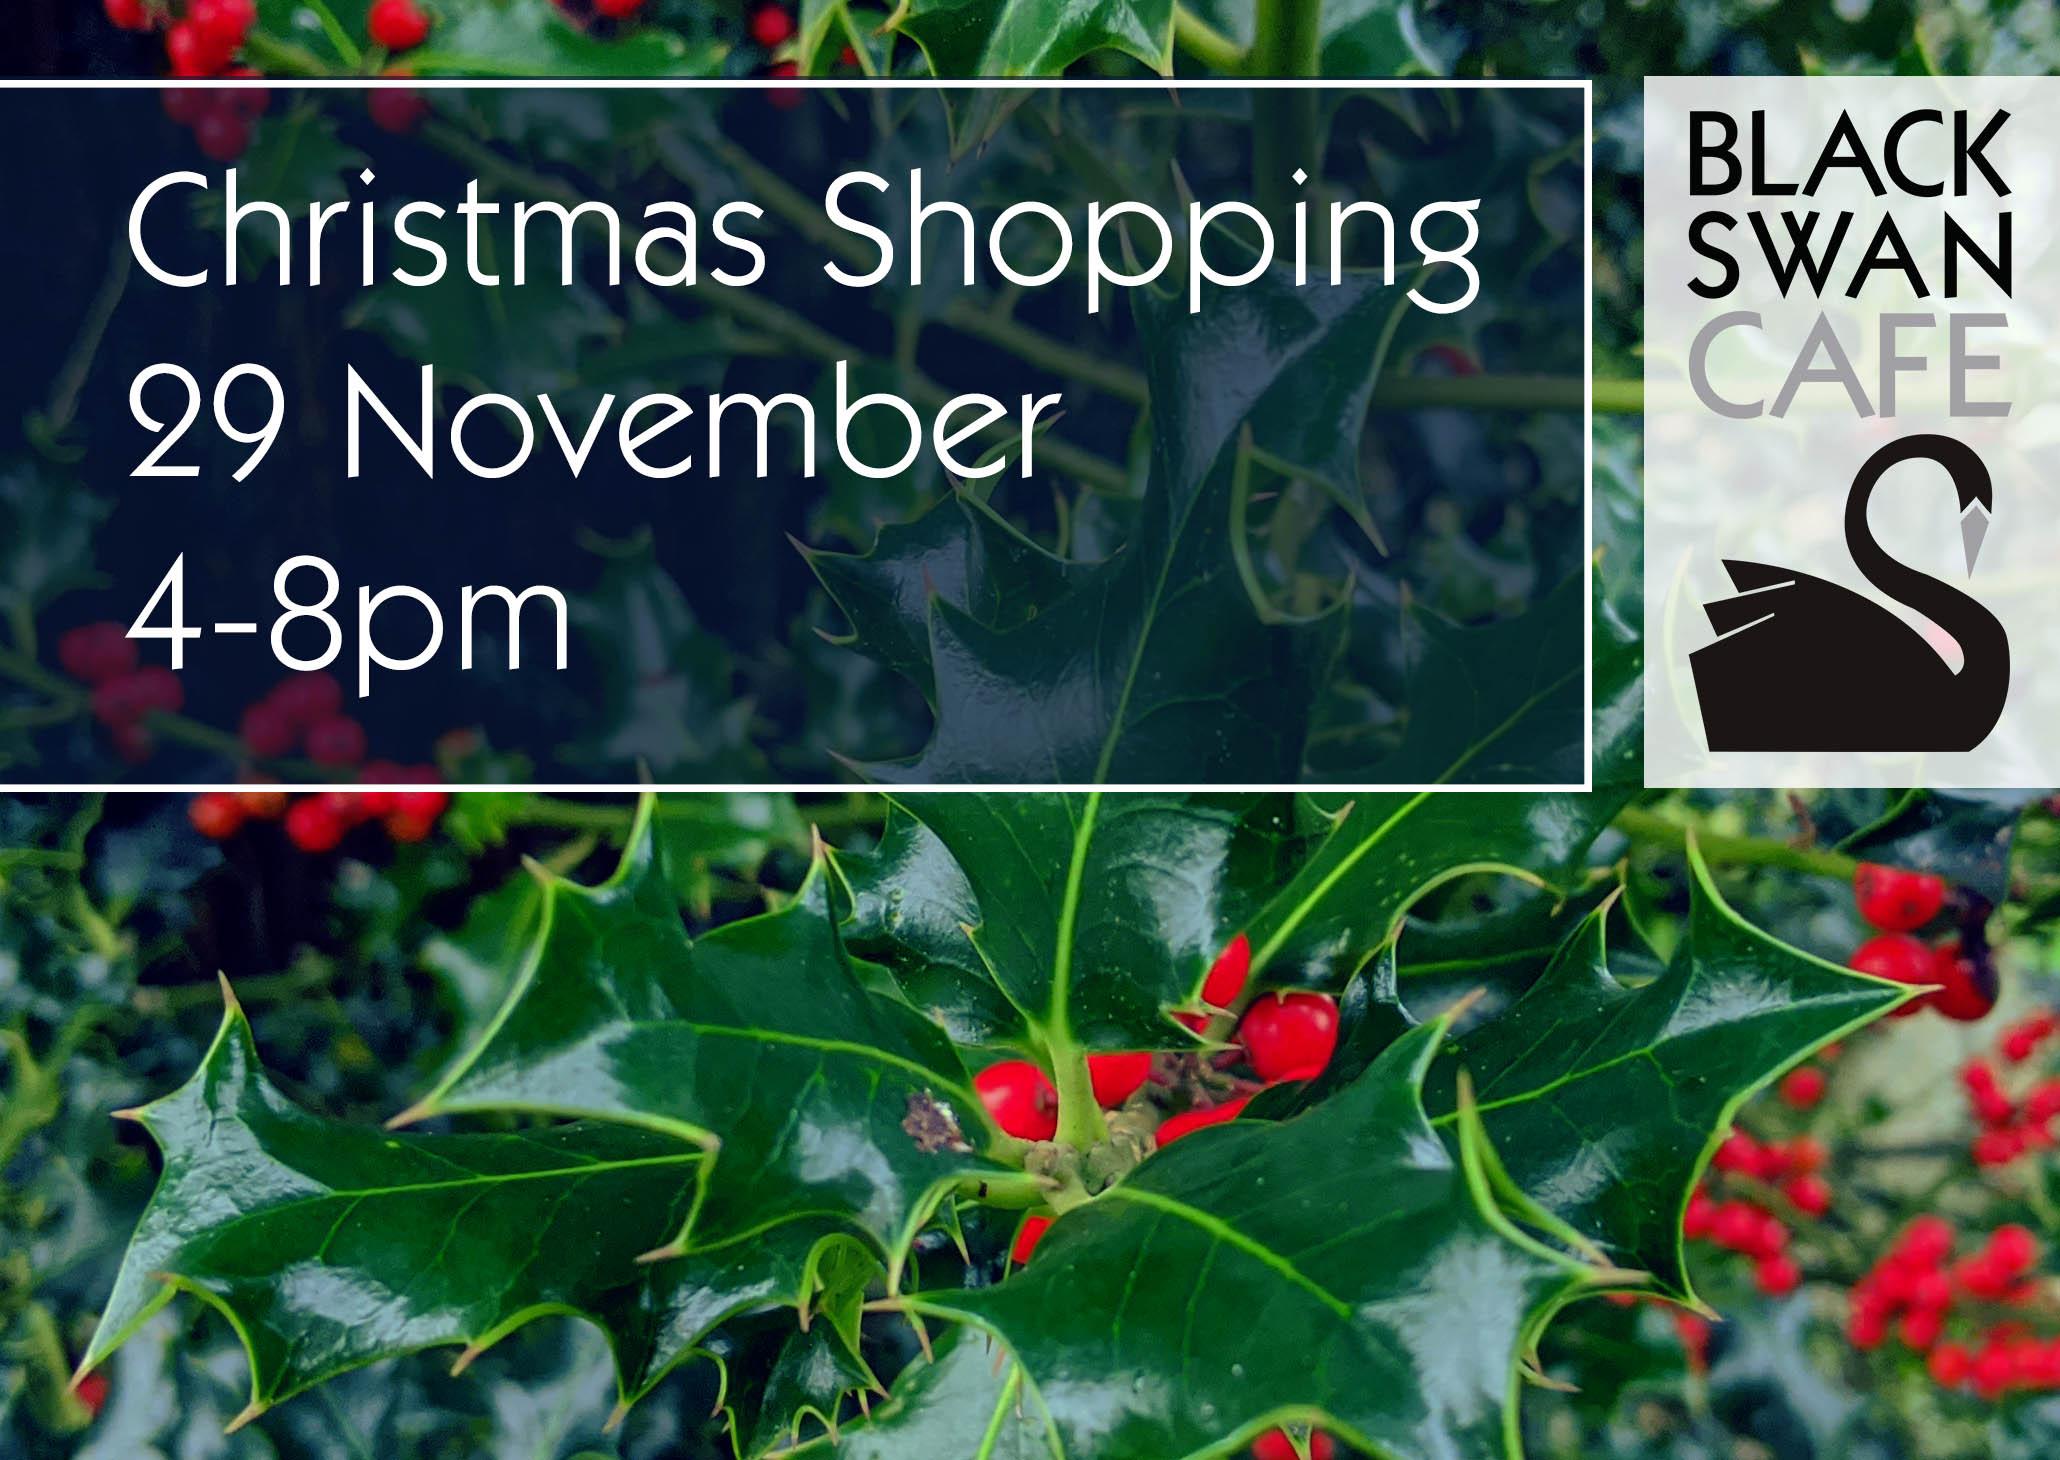 Christmas shopping 29 November, 4-8pm